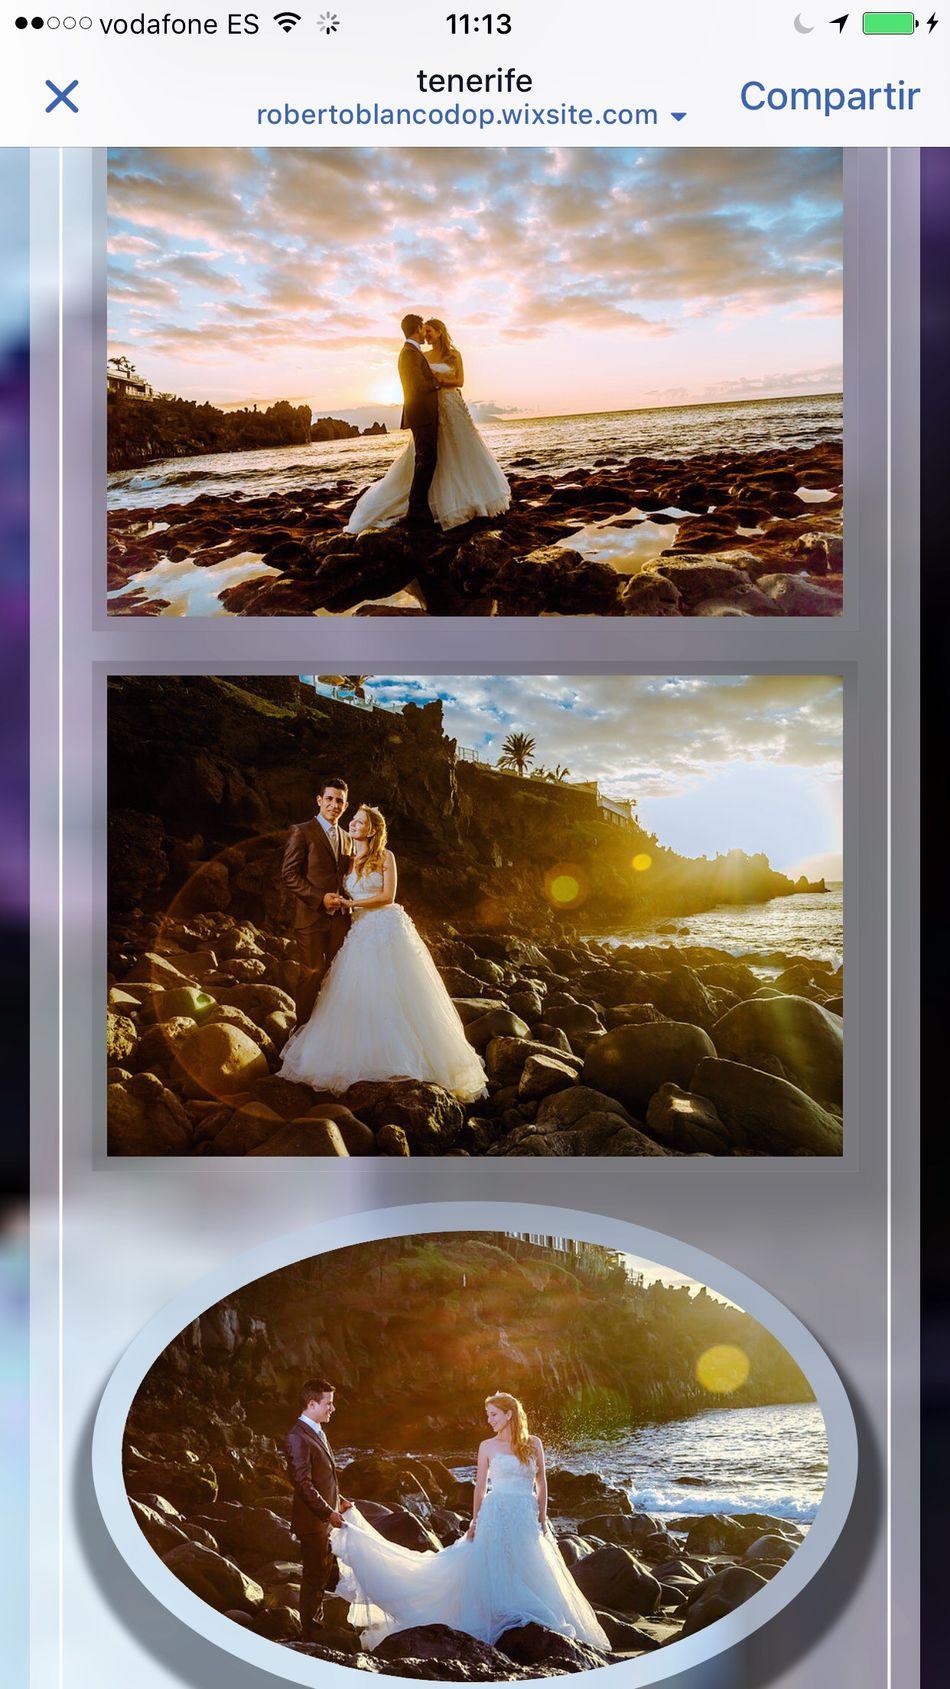 Roberto BLANCO DOP Tenerife Island Canary Islands Fine Art Photography ArtWork God's Beauty WeWorking Wedding Weddings Around The World Wedding Photography Director Of Photography Dopephotography Hello World